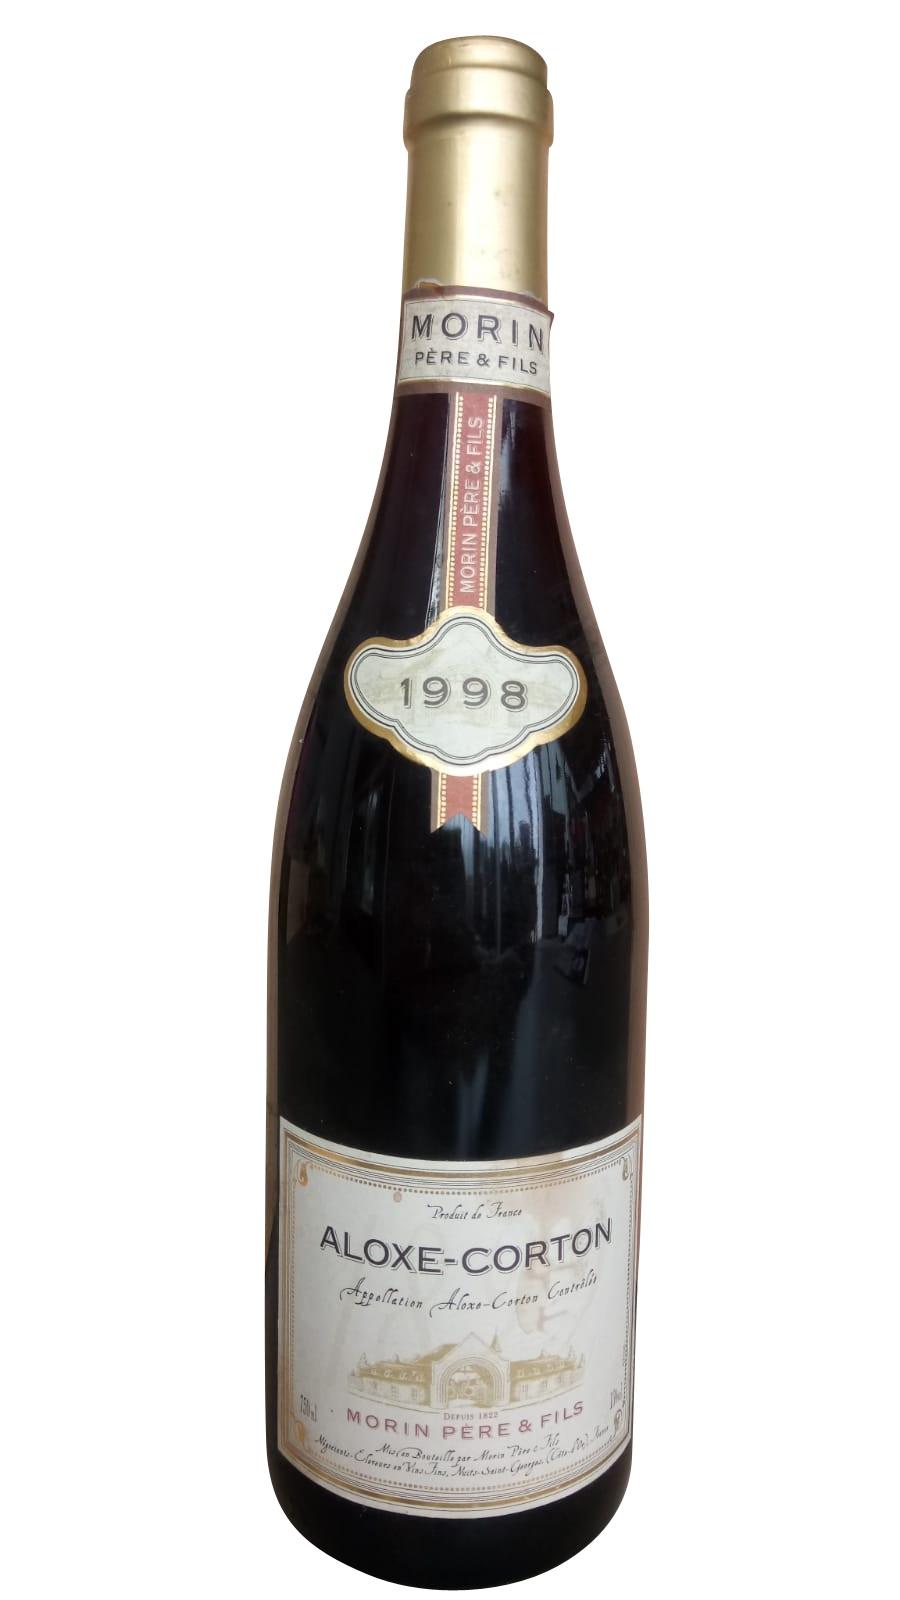 1998 Aloxe-Corton Morin Père & Fils AC